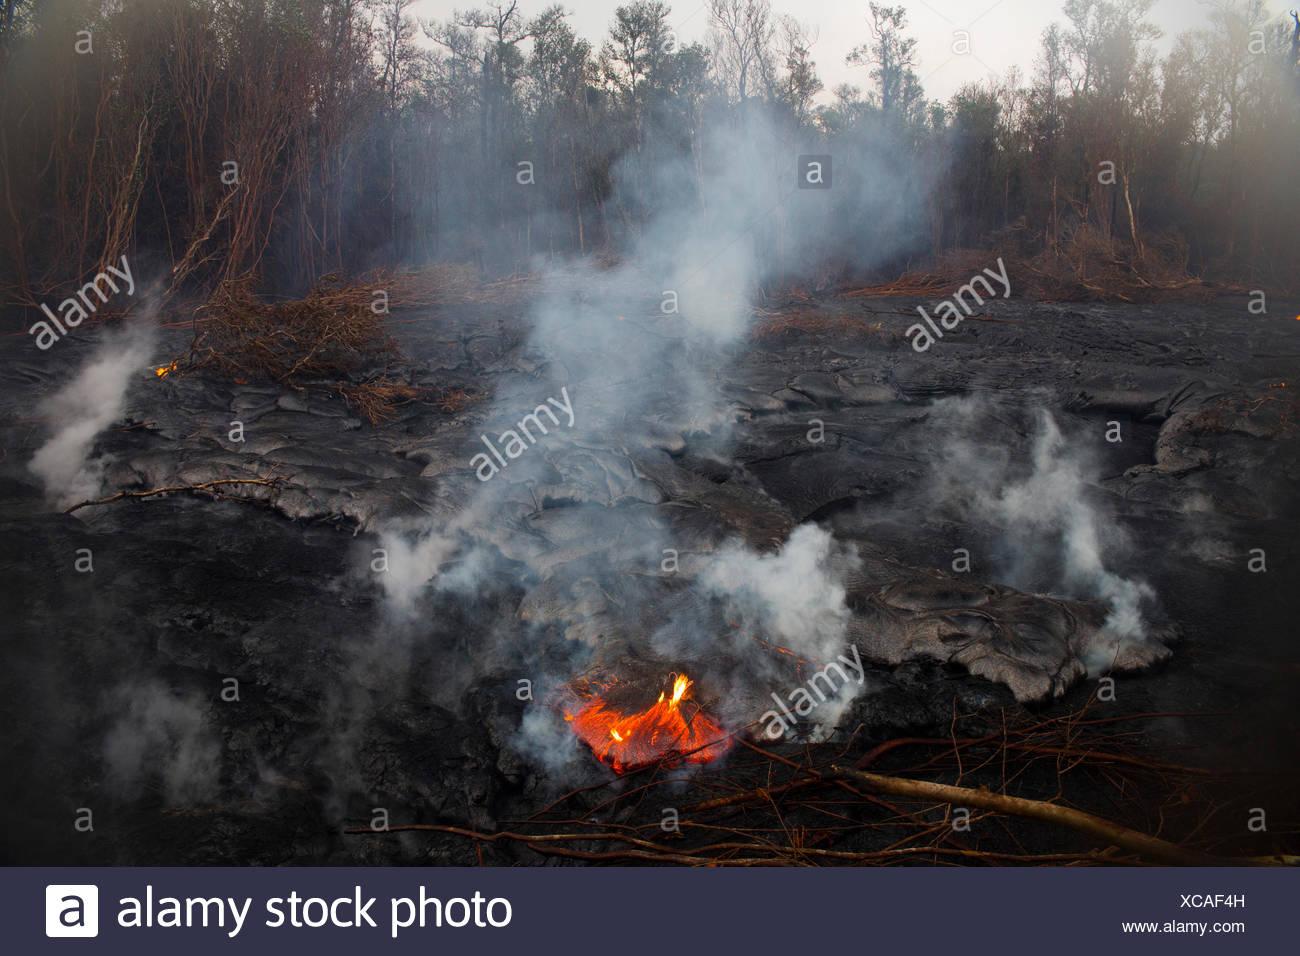 Big Island,destroy,rain forest,Kahaualea Natural aera reserve,reserve,Vulcanoes,National Park,Big Island,USA,Hawaii,Am - Stock Image